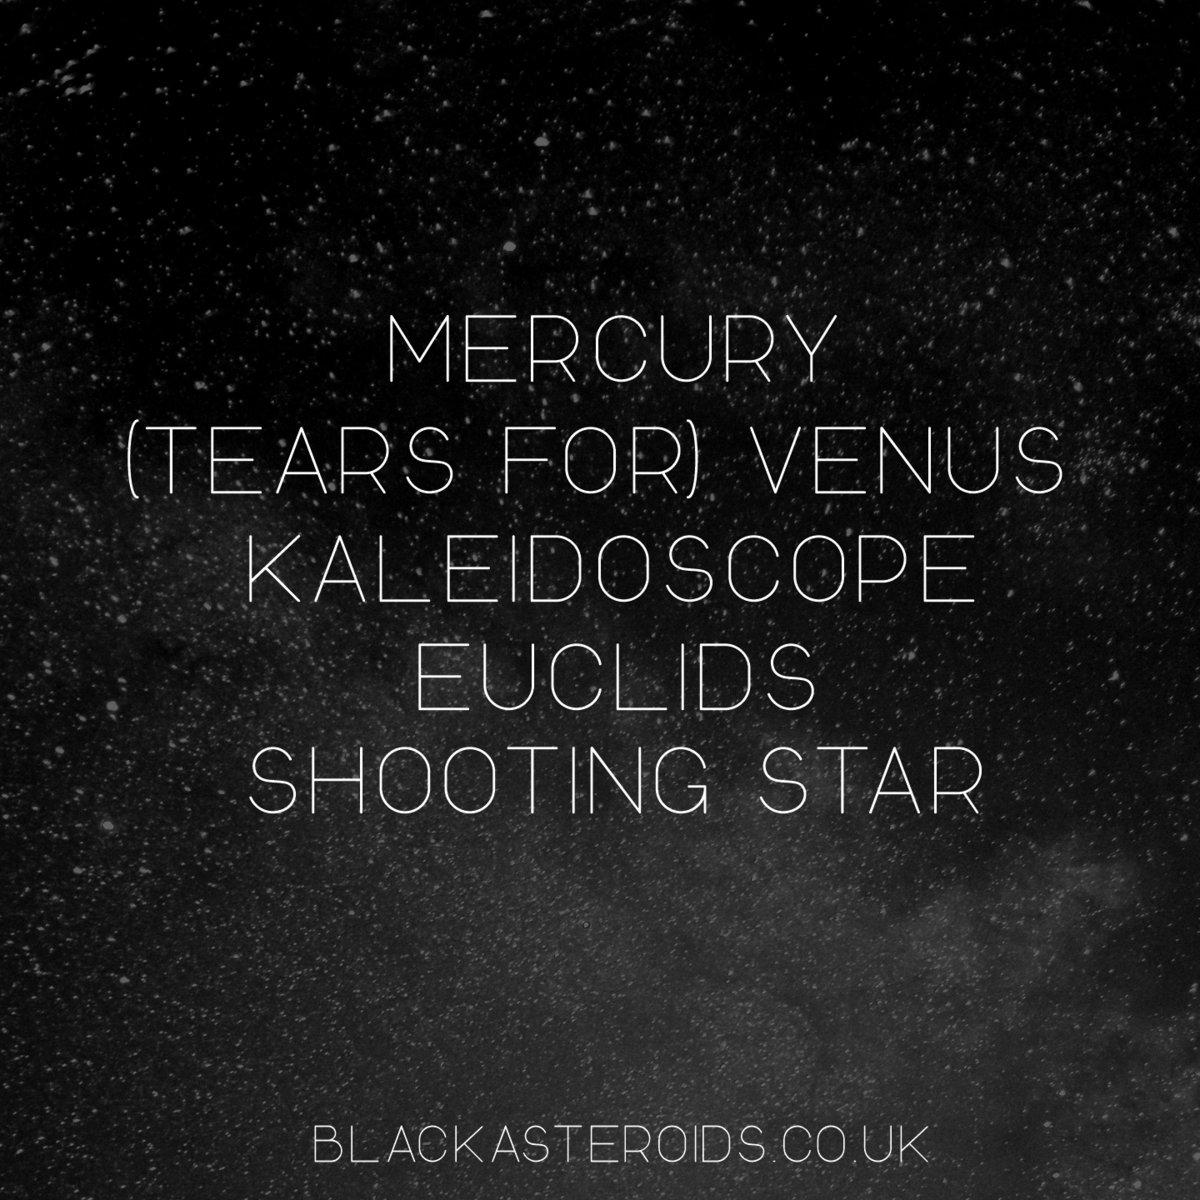 shooting star black asteroids